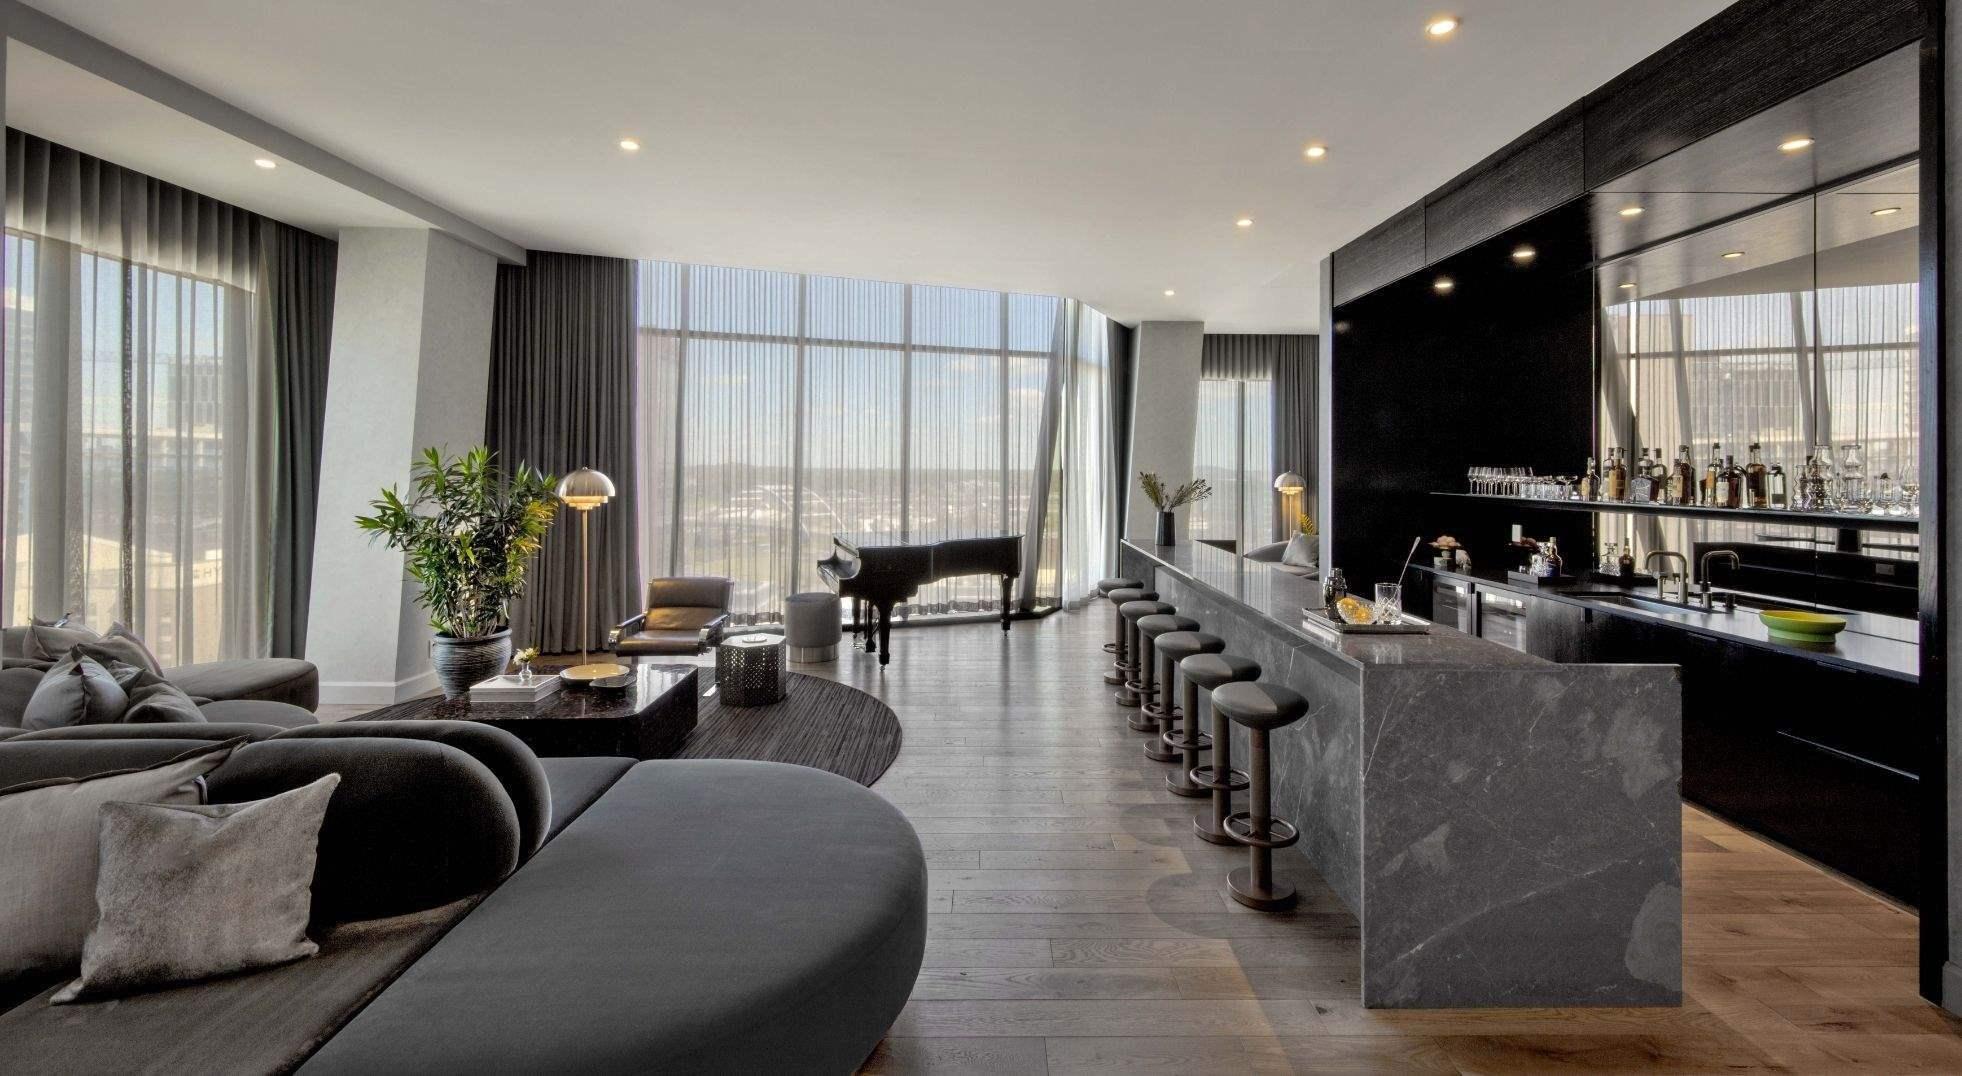 The Joseph Hotel, Nashville offers Presidential Suite